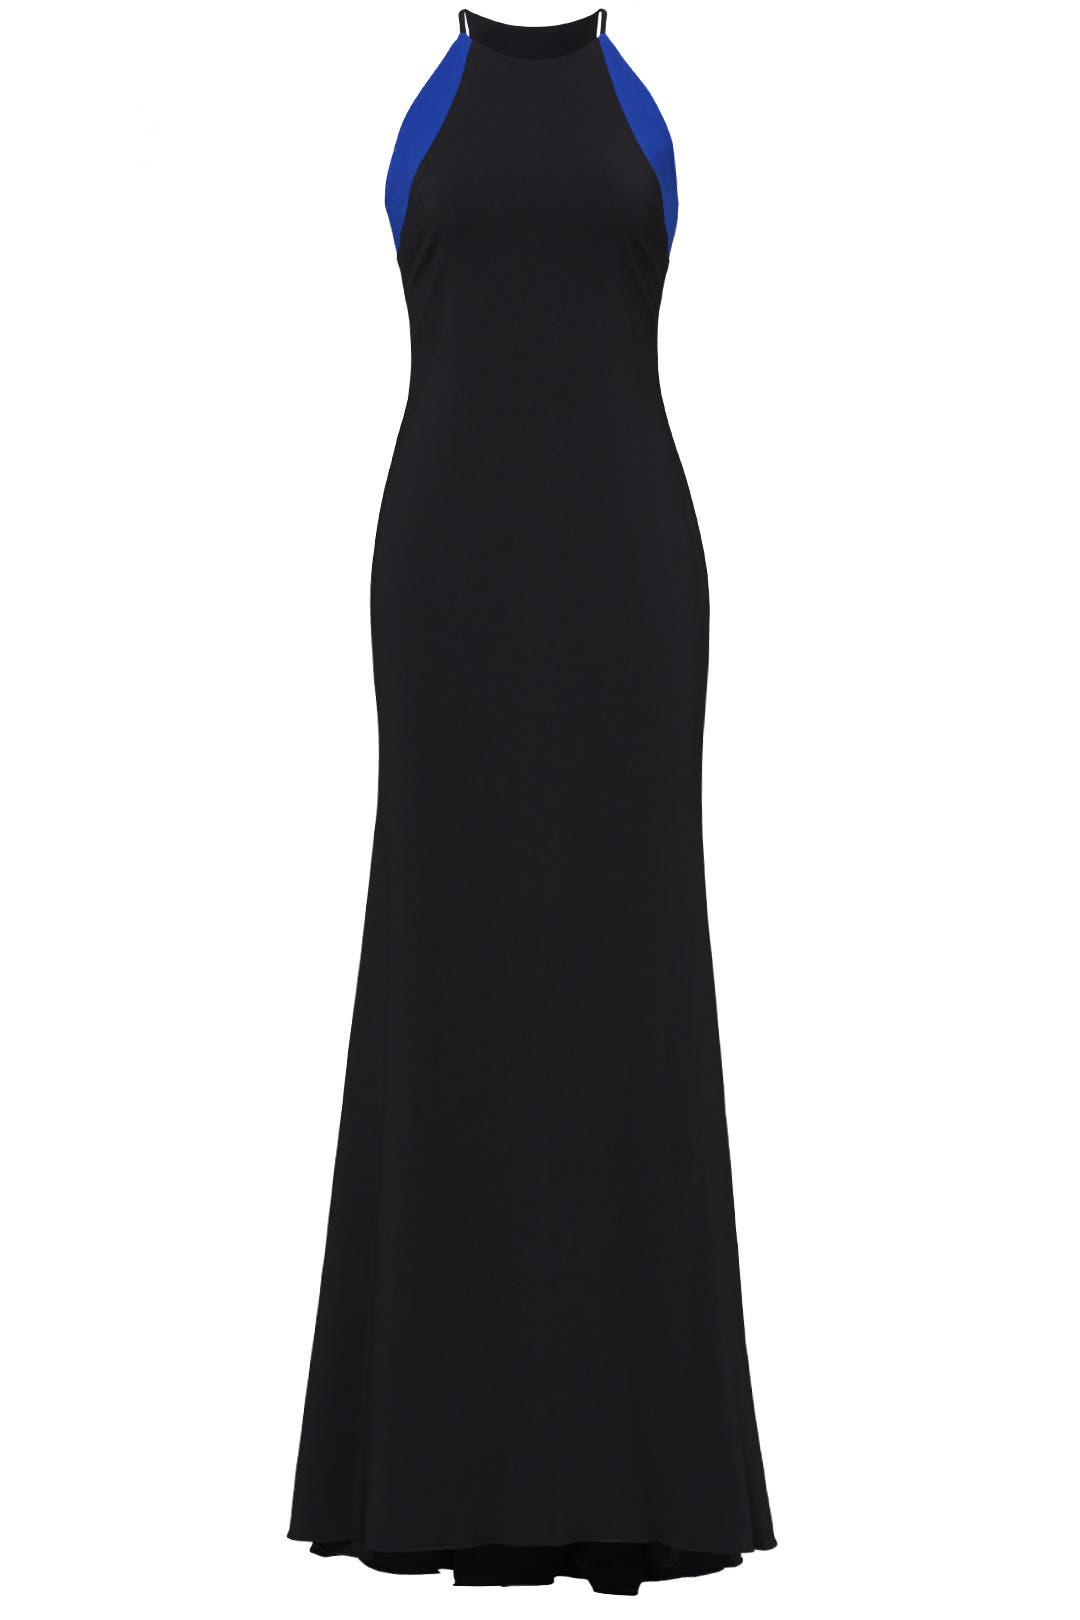 Cobalt Stripe Racerback Gown by Badgley Mischka for $80   Rent the ...